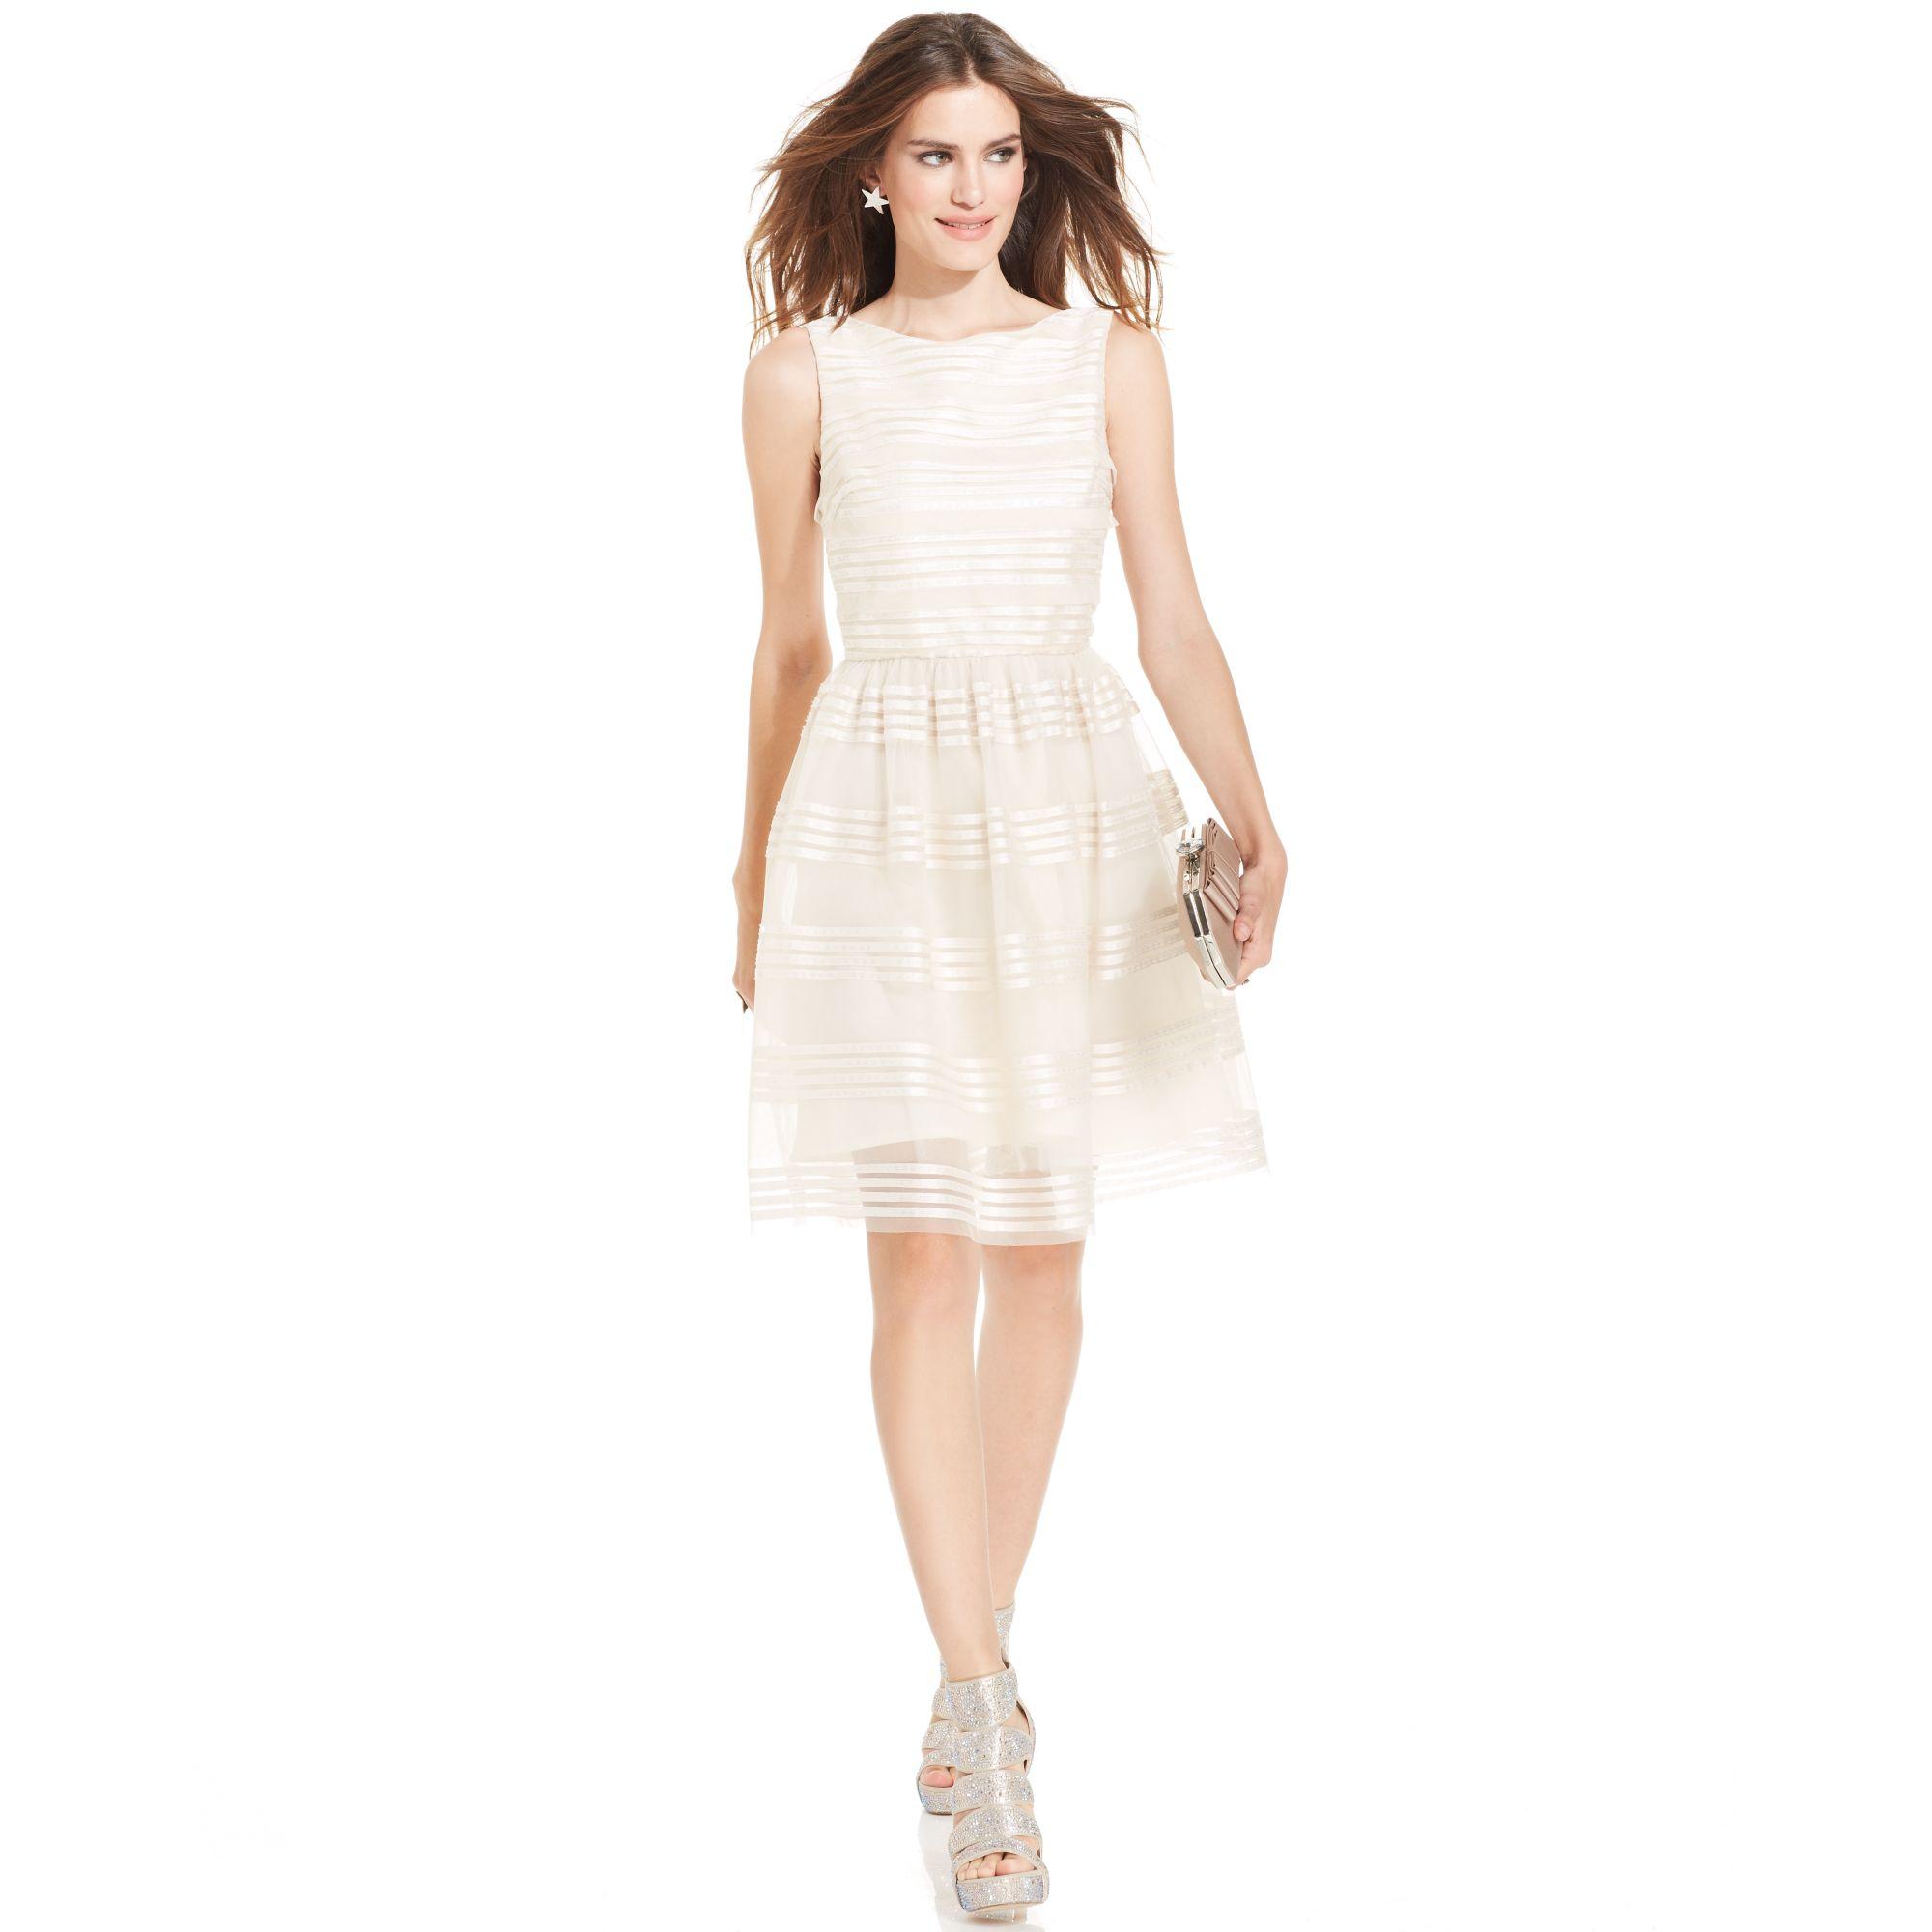 Betsey johnson white dress.